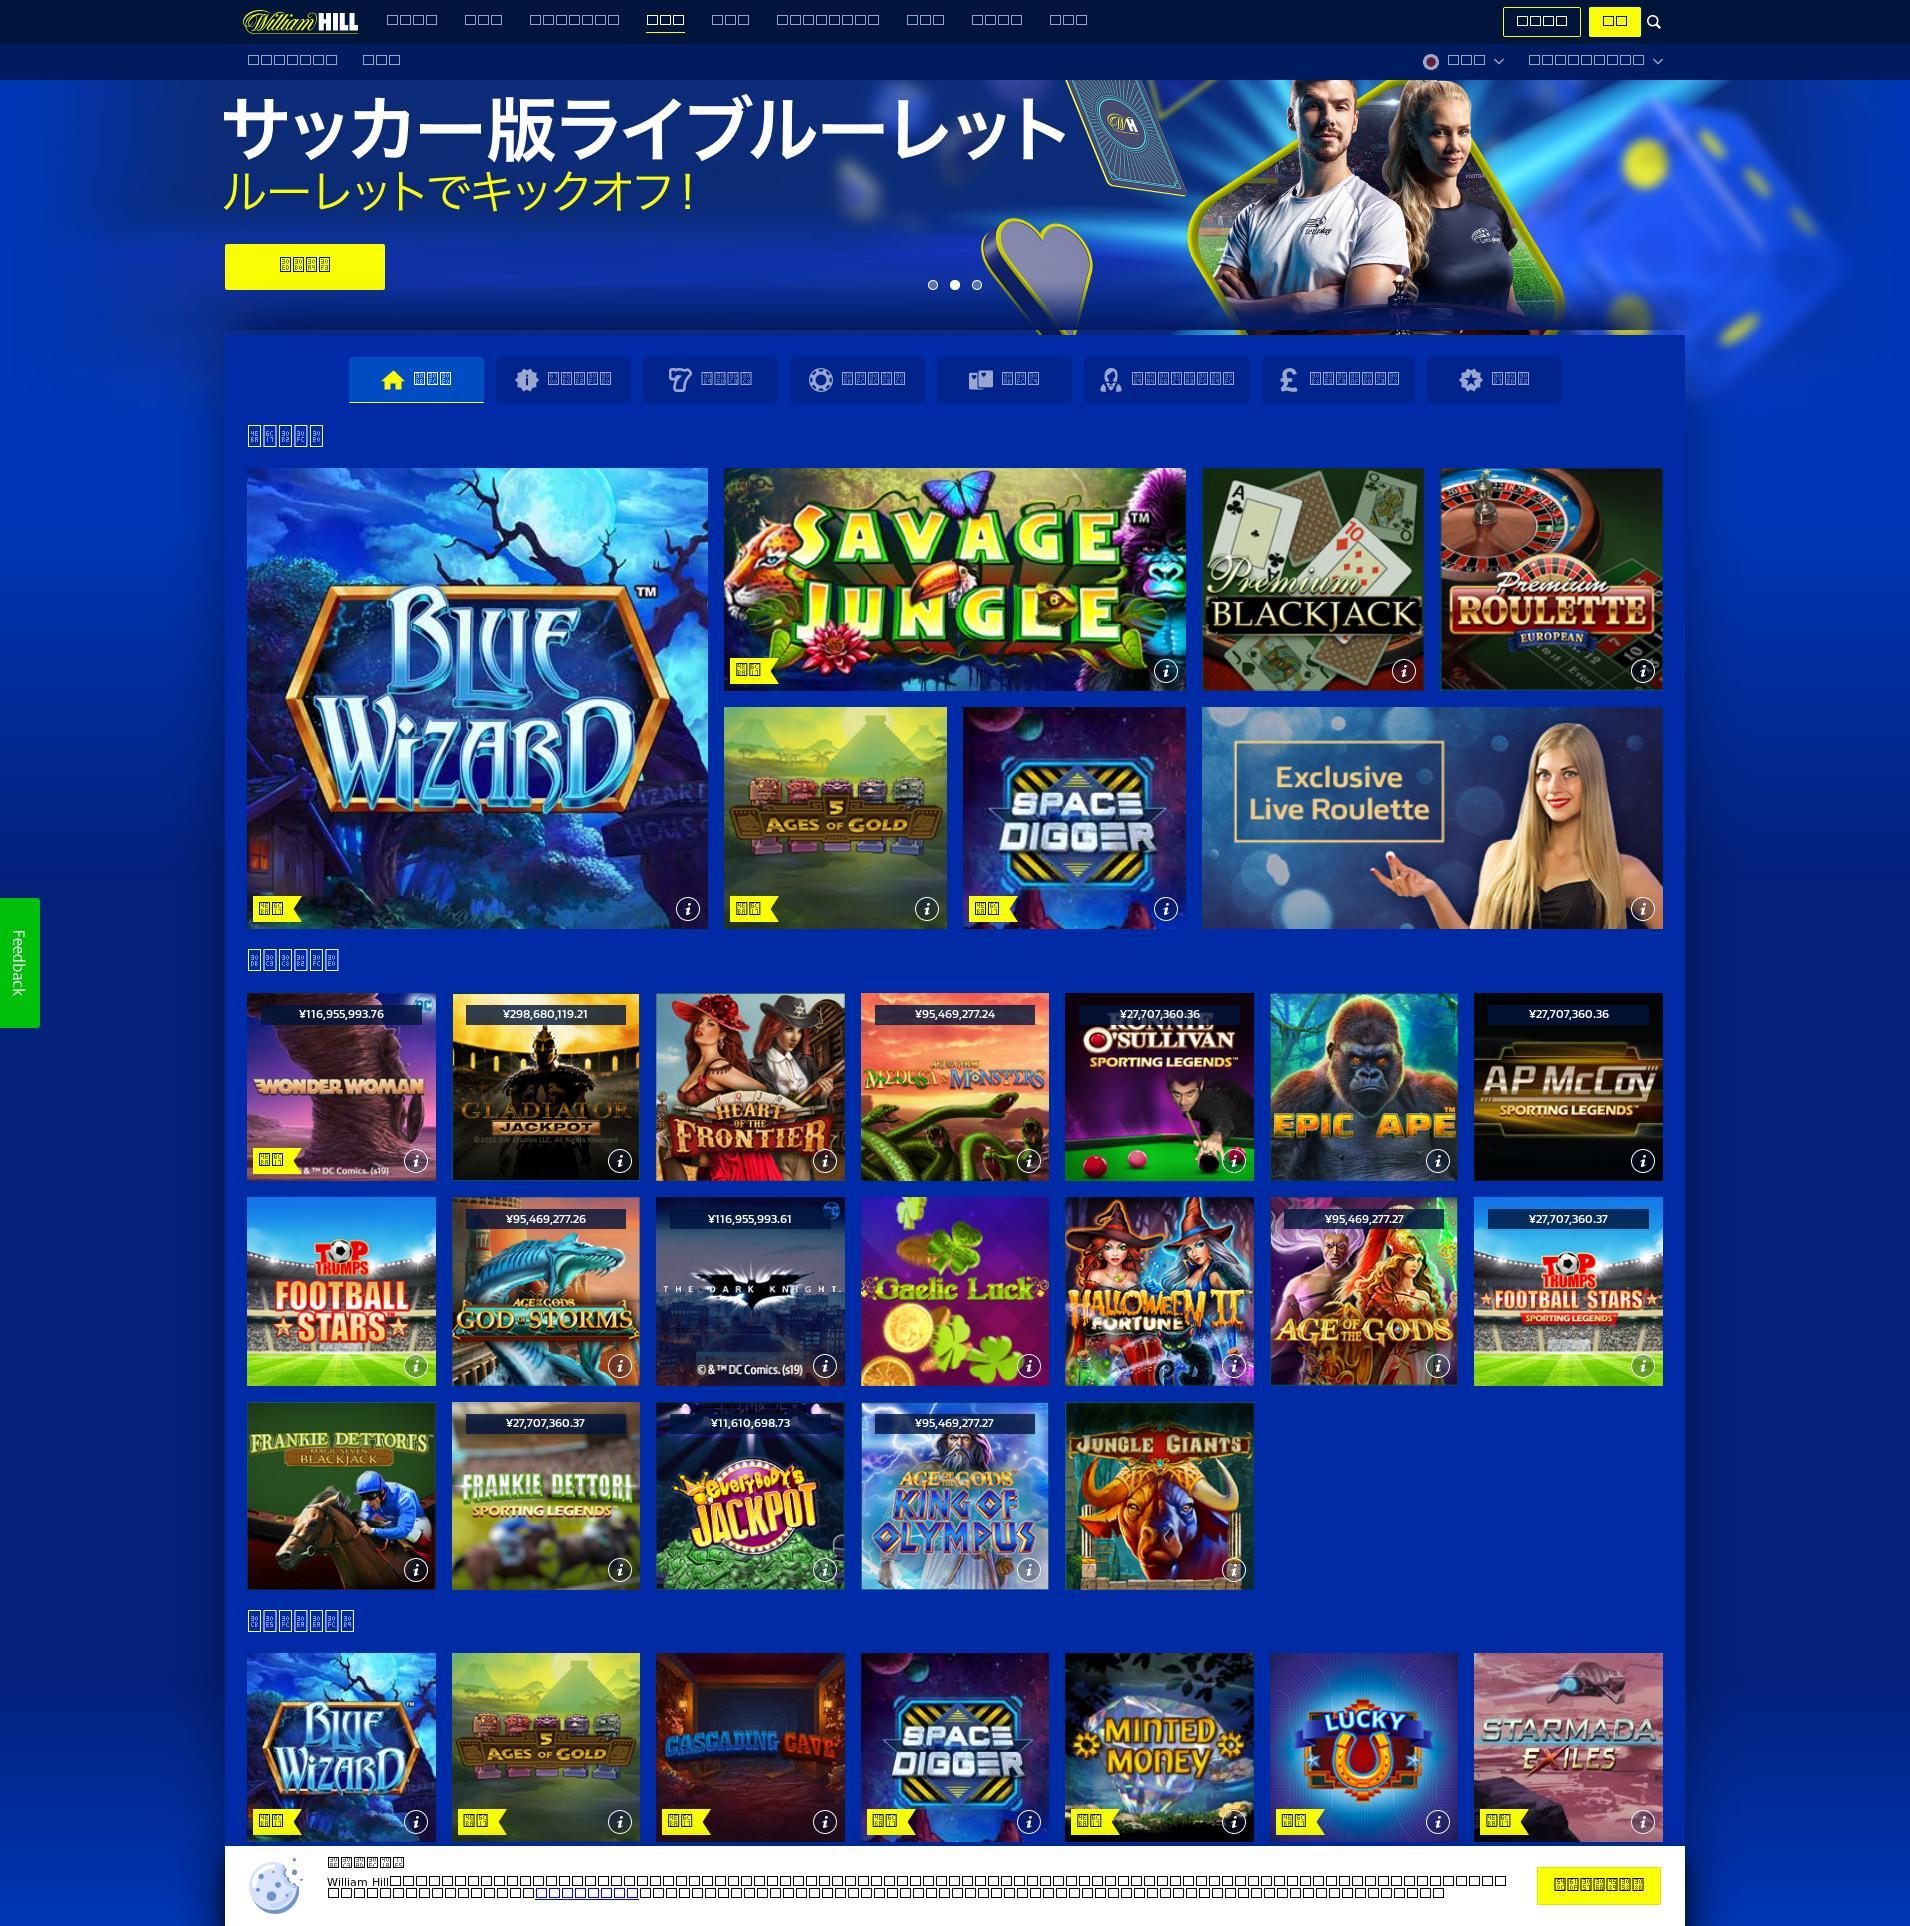 Casino screen Lobby 2019-08-18 for Japan